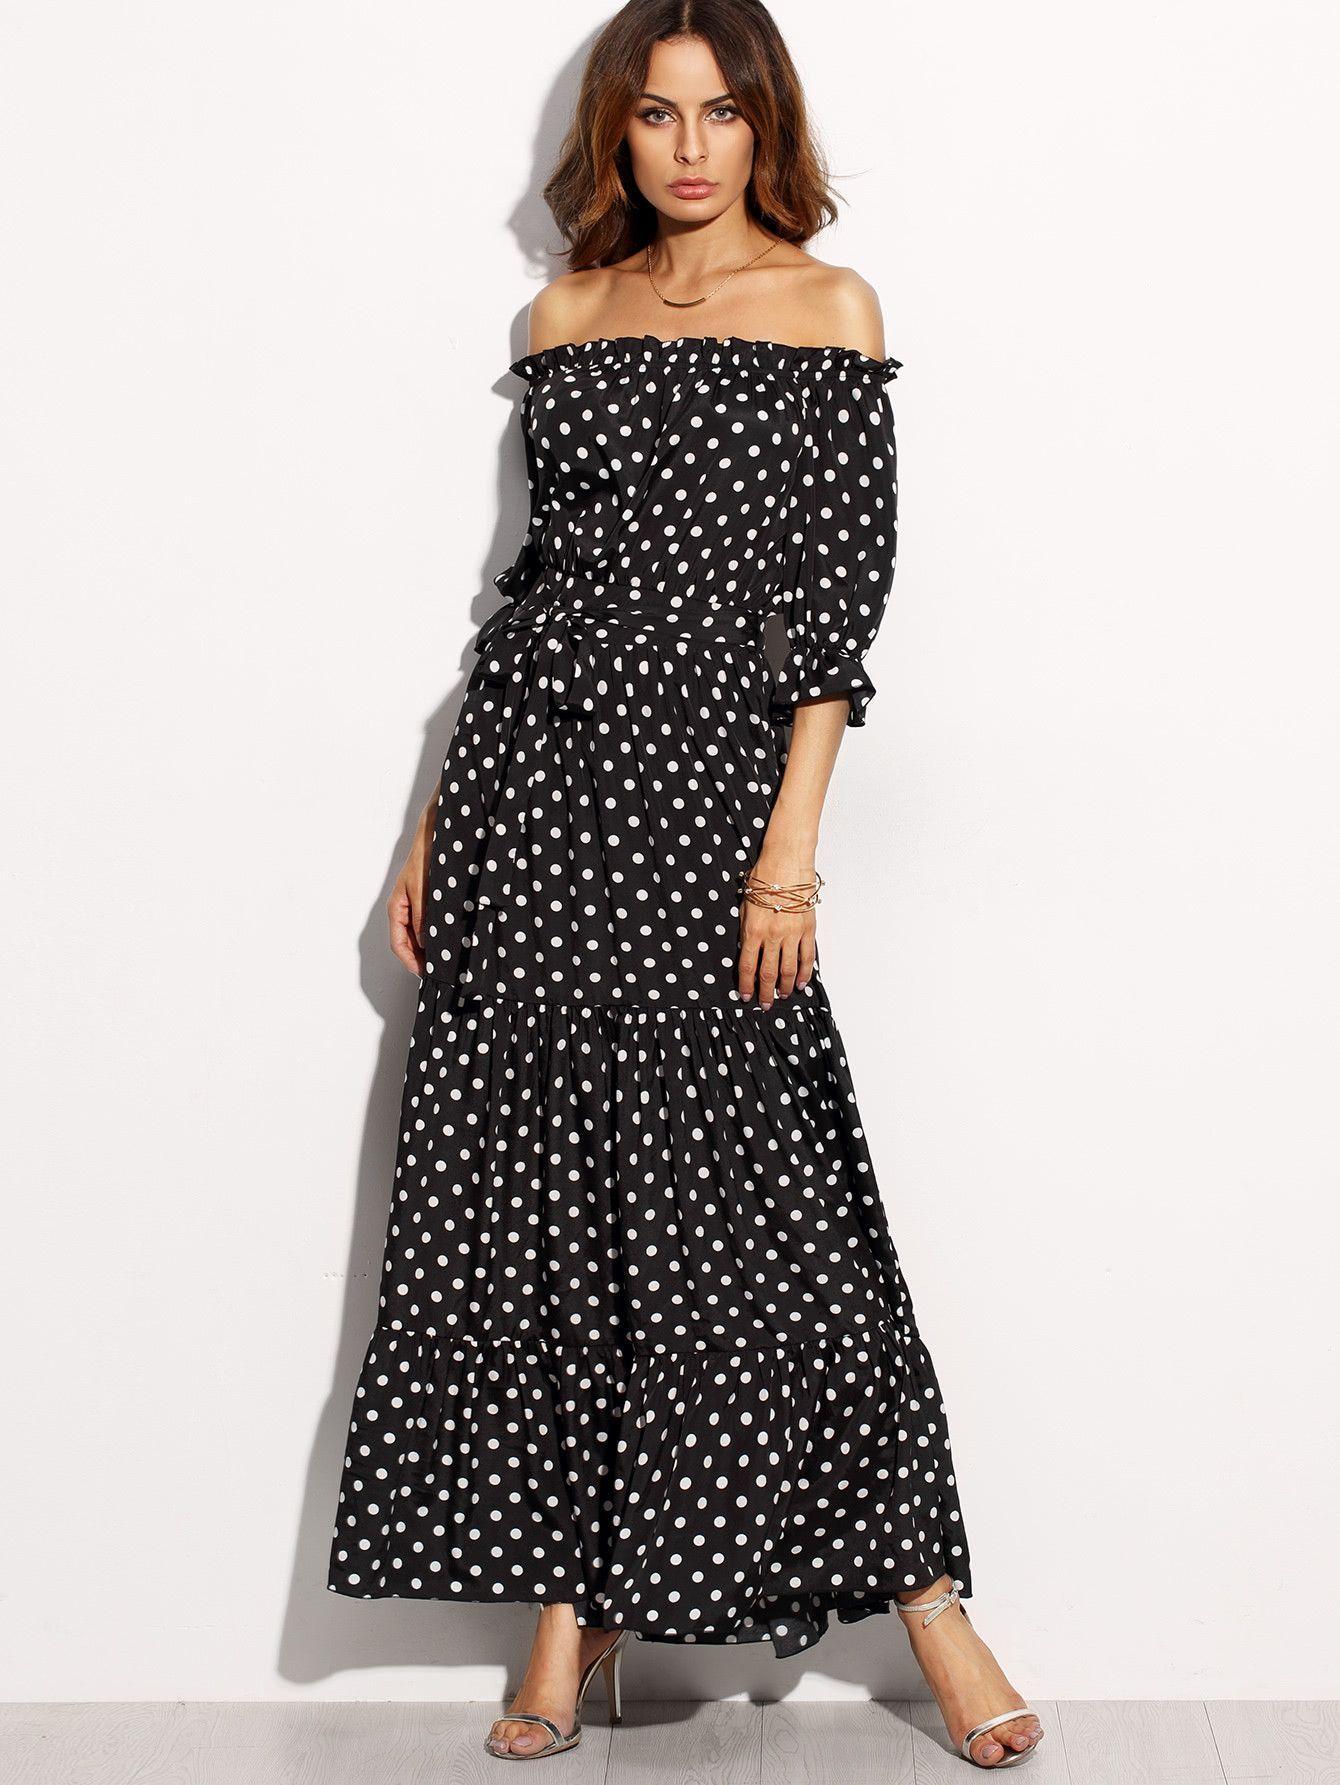 4015e57d4c142e Belt  YES Fabric  Fabric has no stretch Season  Summer Pattern Type  Polka  Dot Sleeve Length  Half Sleeve Color  Black and White Dresses Length  Maxi  Style  ...